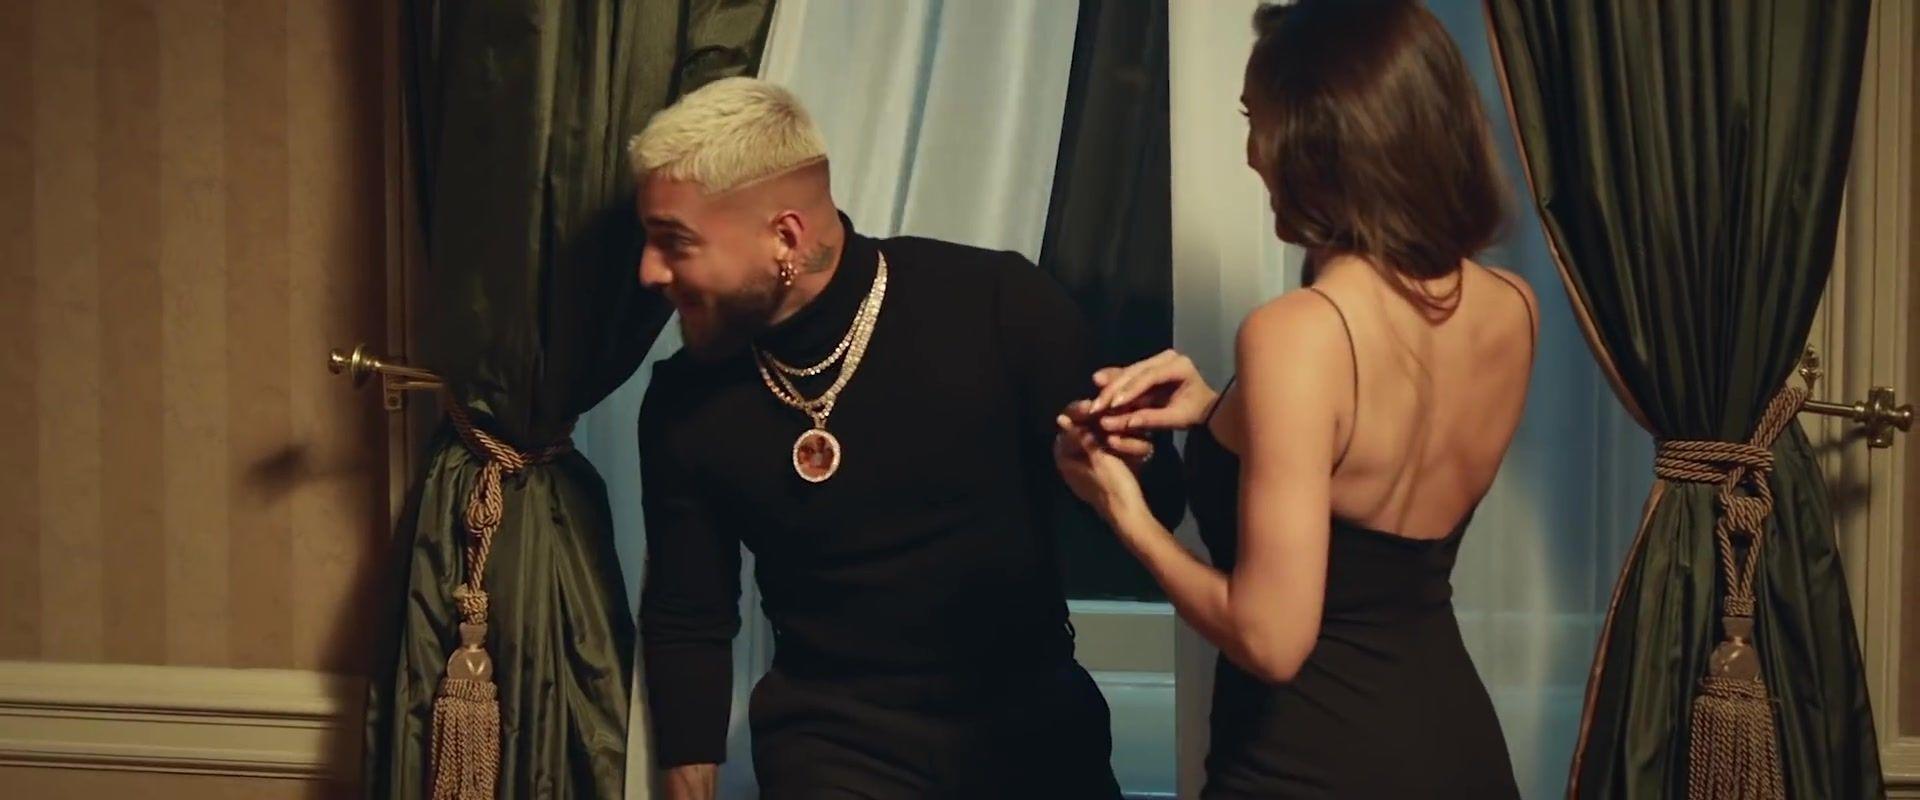 Que Pena By Maluma And J Balvin Latin Music Video Outfits Music Video Outfit Latin Music Music Videos